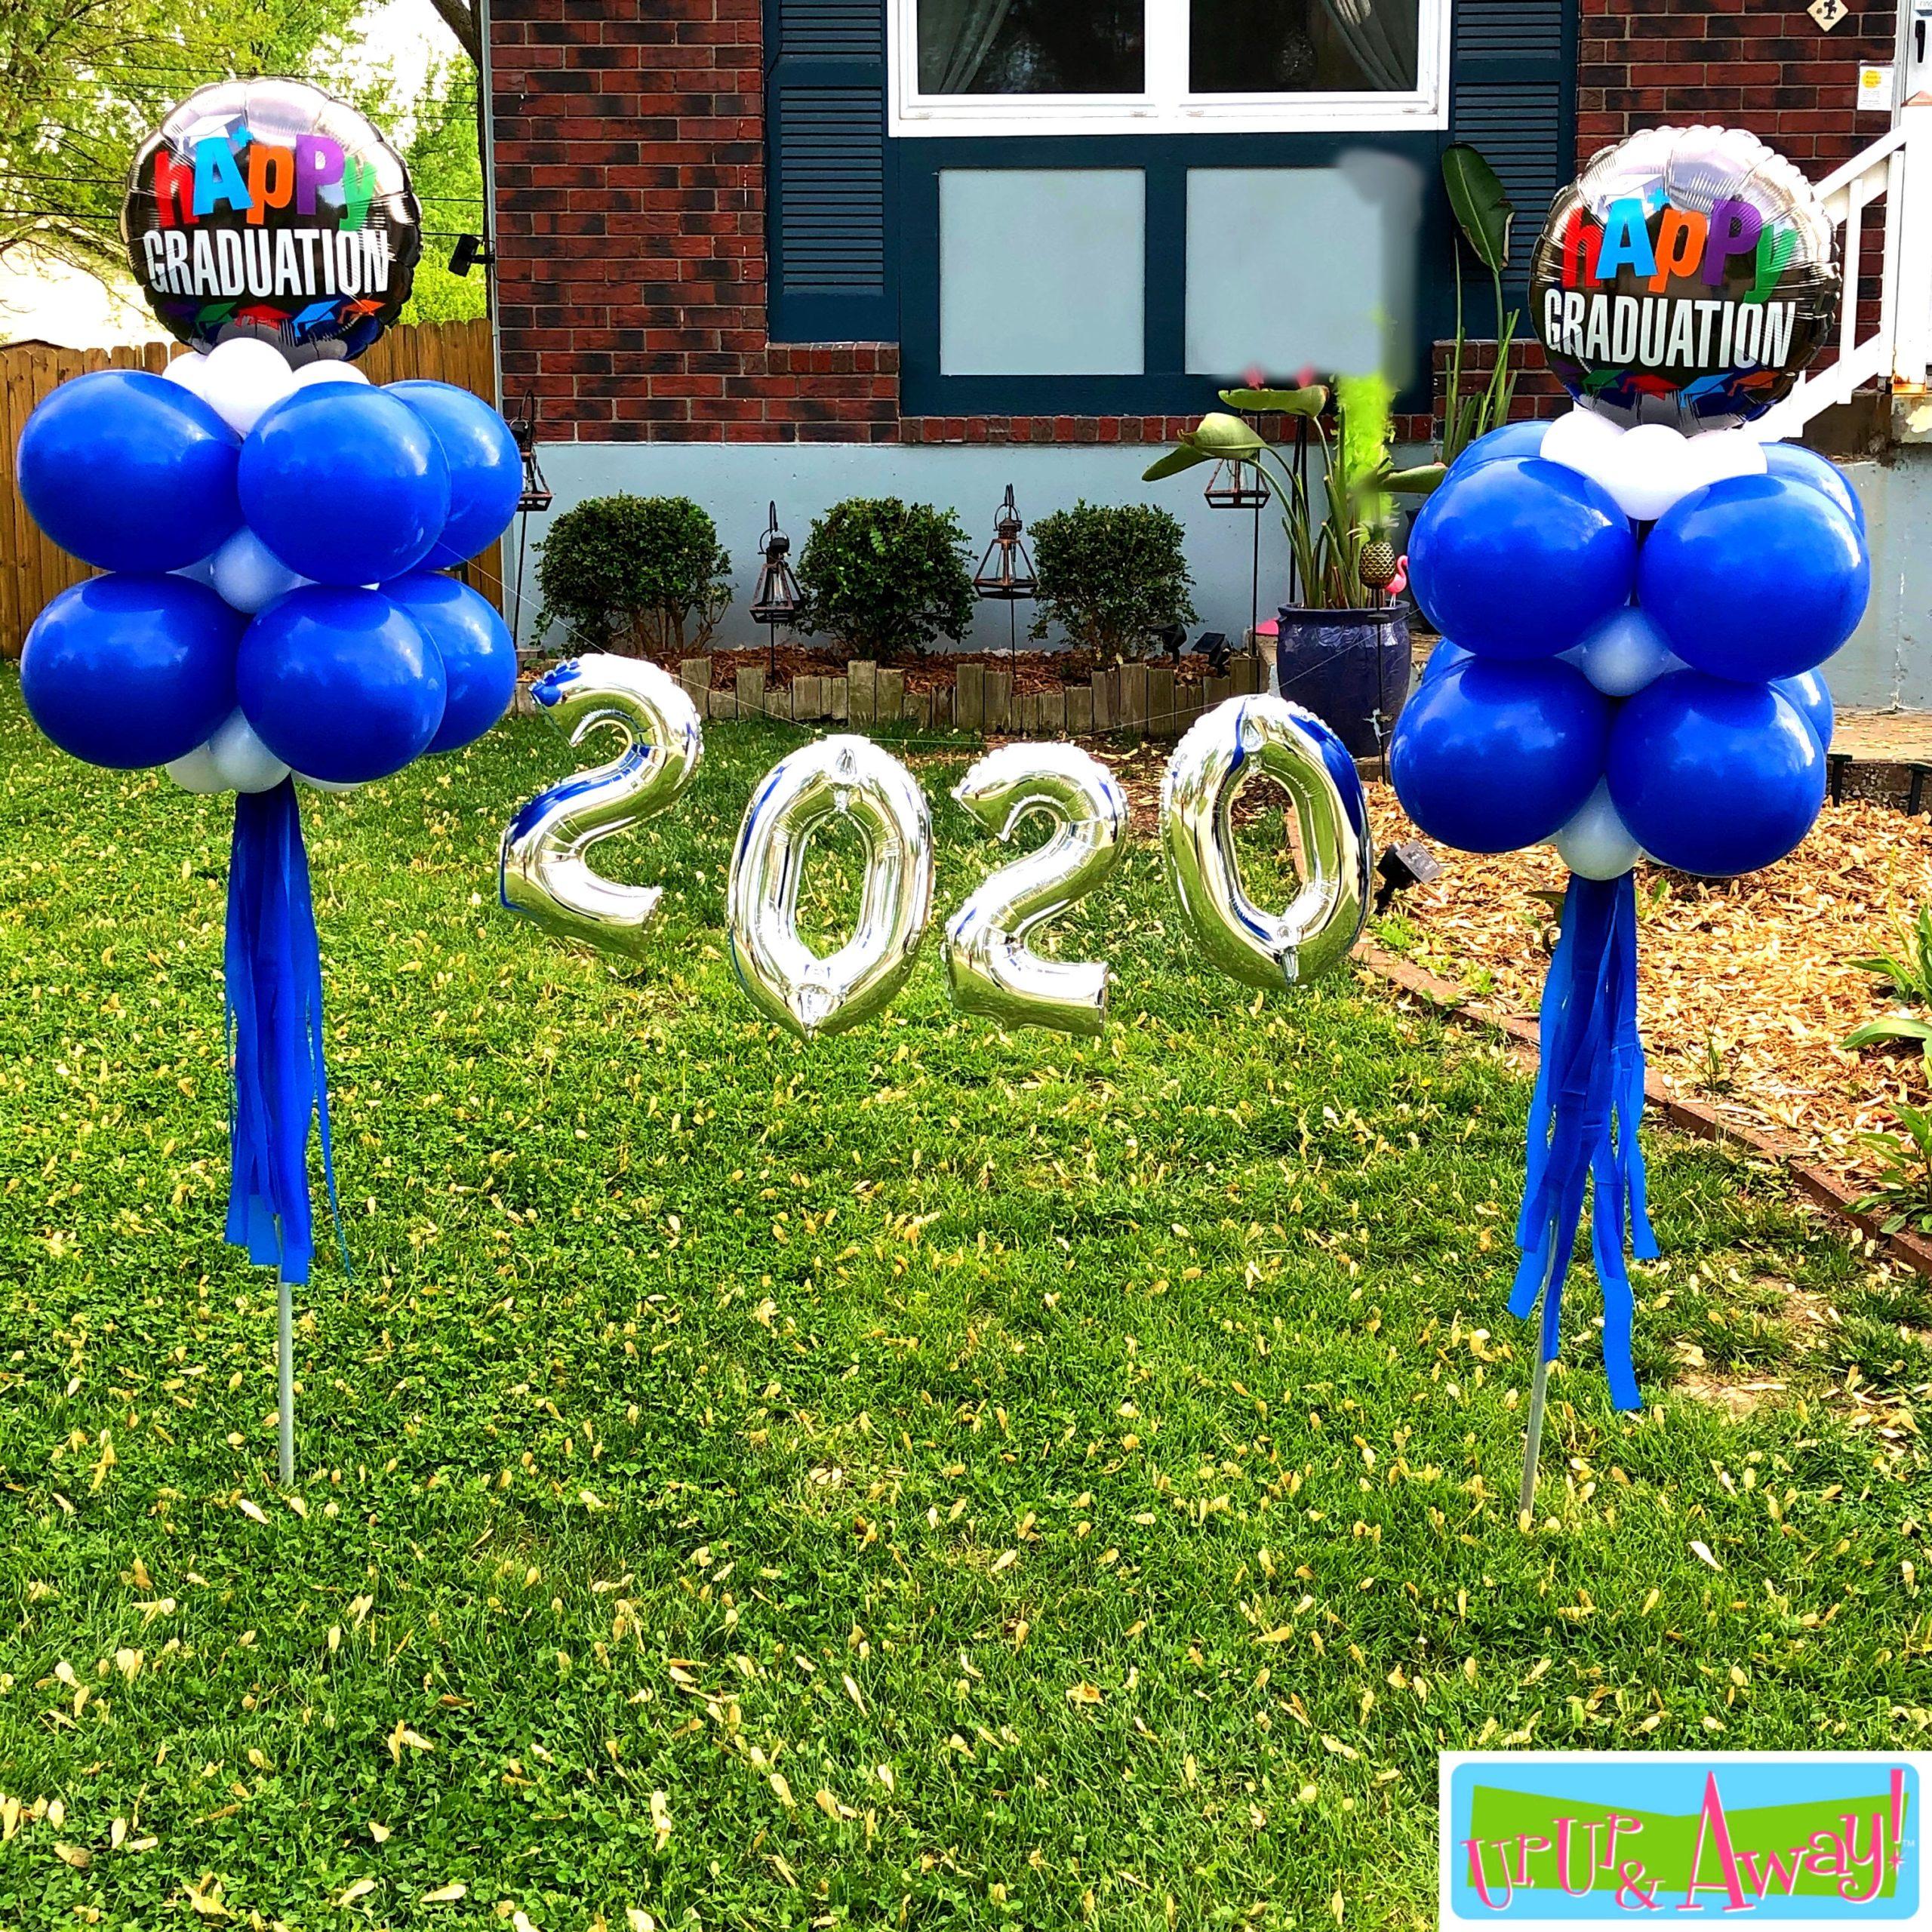 Graduation Banner | Up, Up & Away! Balloons